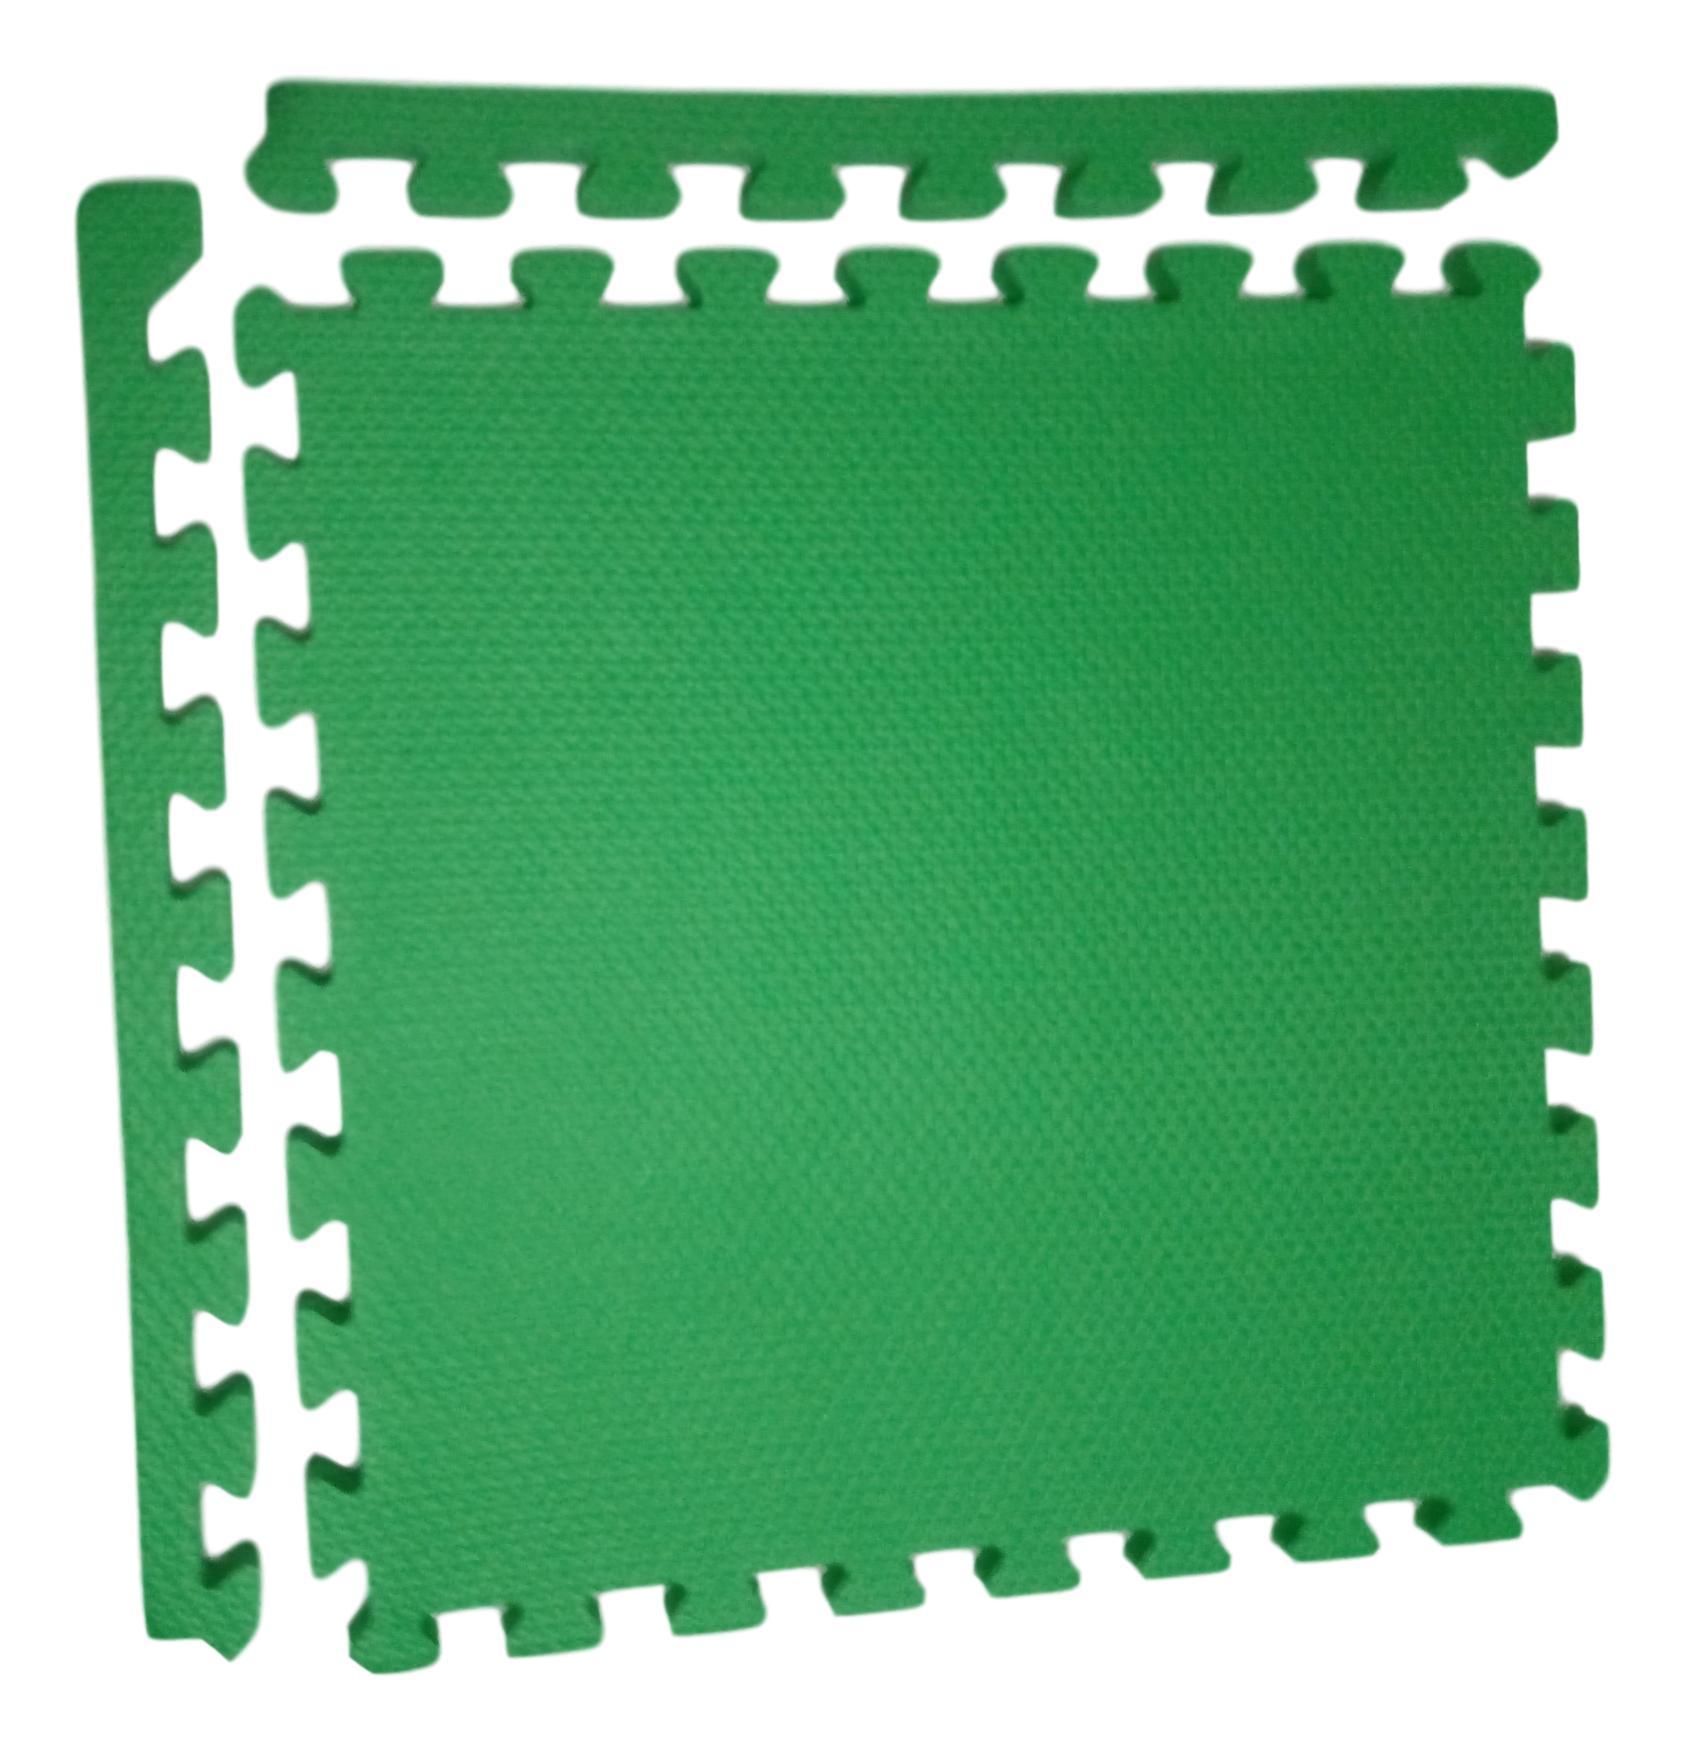 Kit 12 Tapetes Tatames Coloridos Eva 50cm X 50cm X 15mm C/ Borda